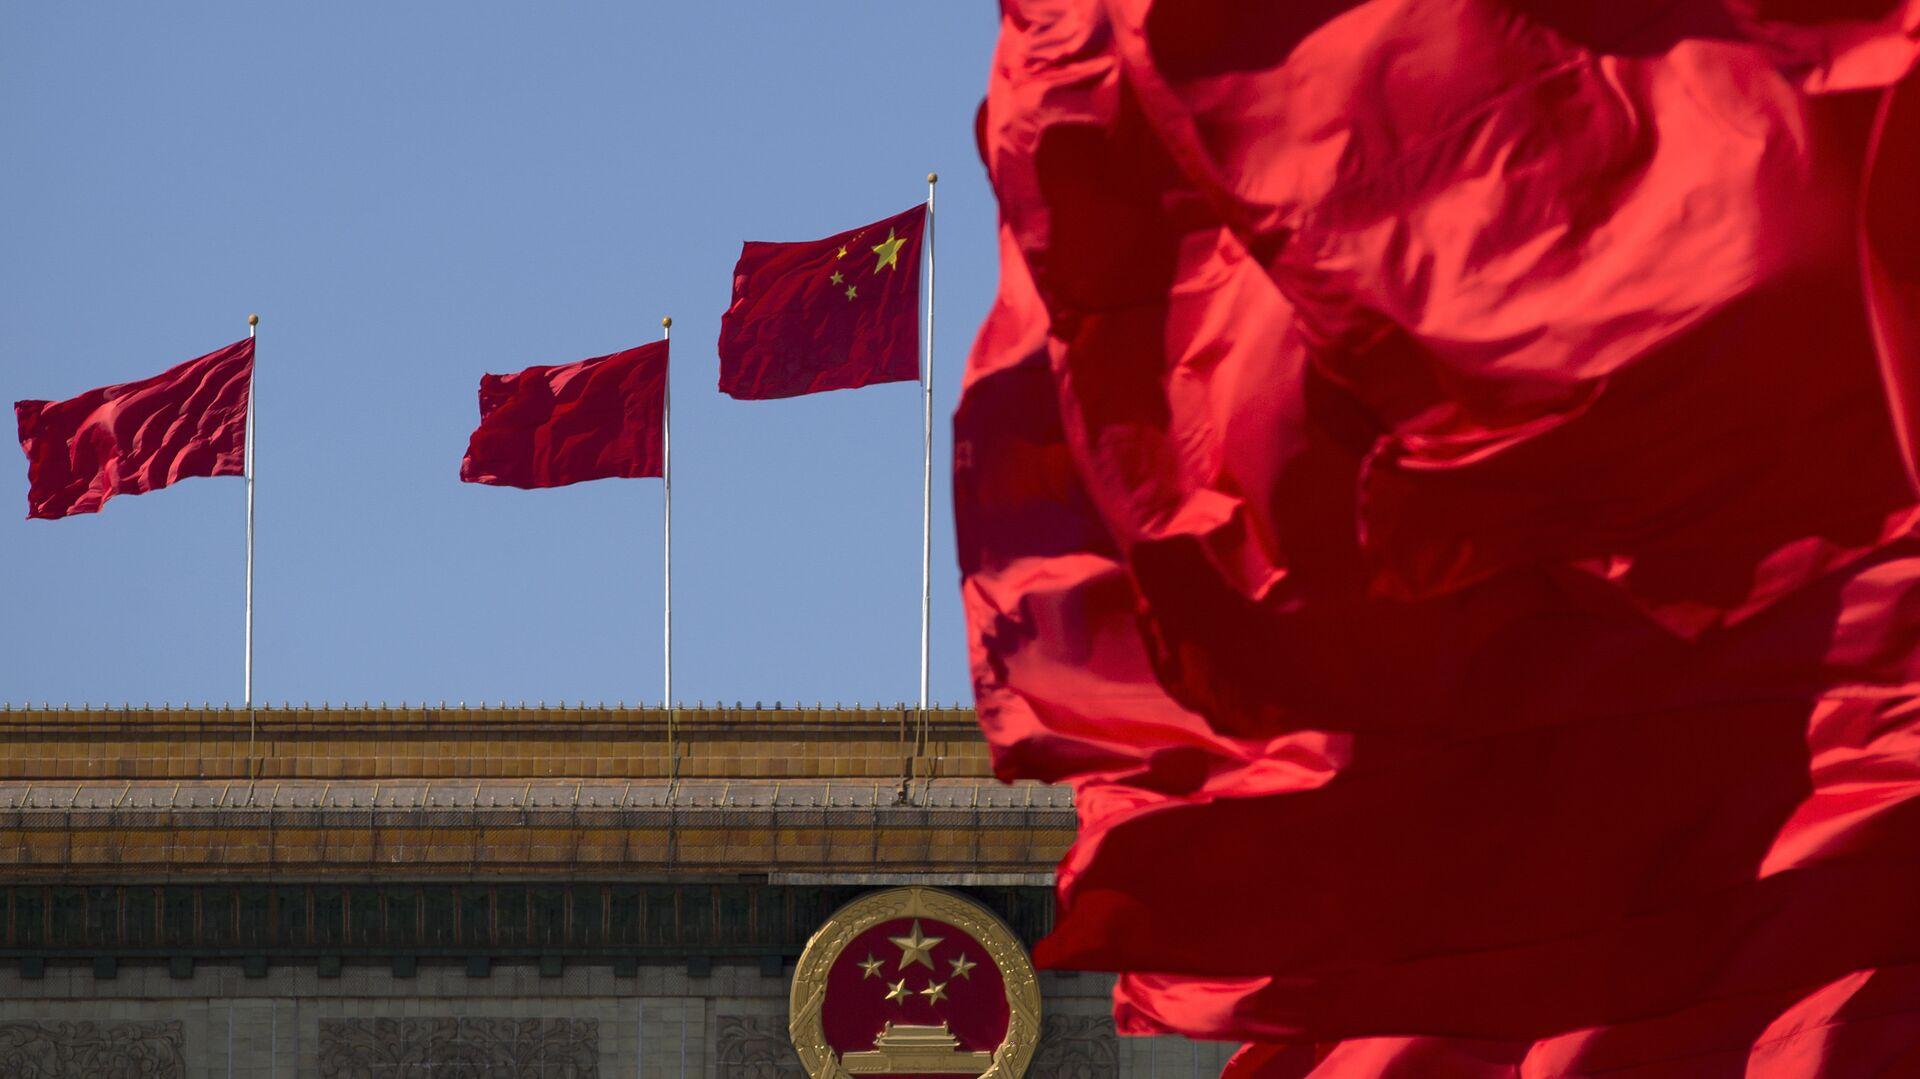 La bandera nacional de China - Sputnik Mundo, 1920, 23.06.2021